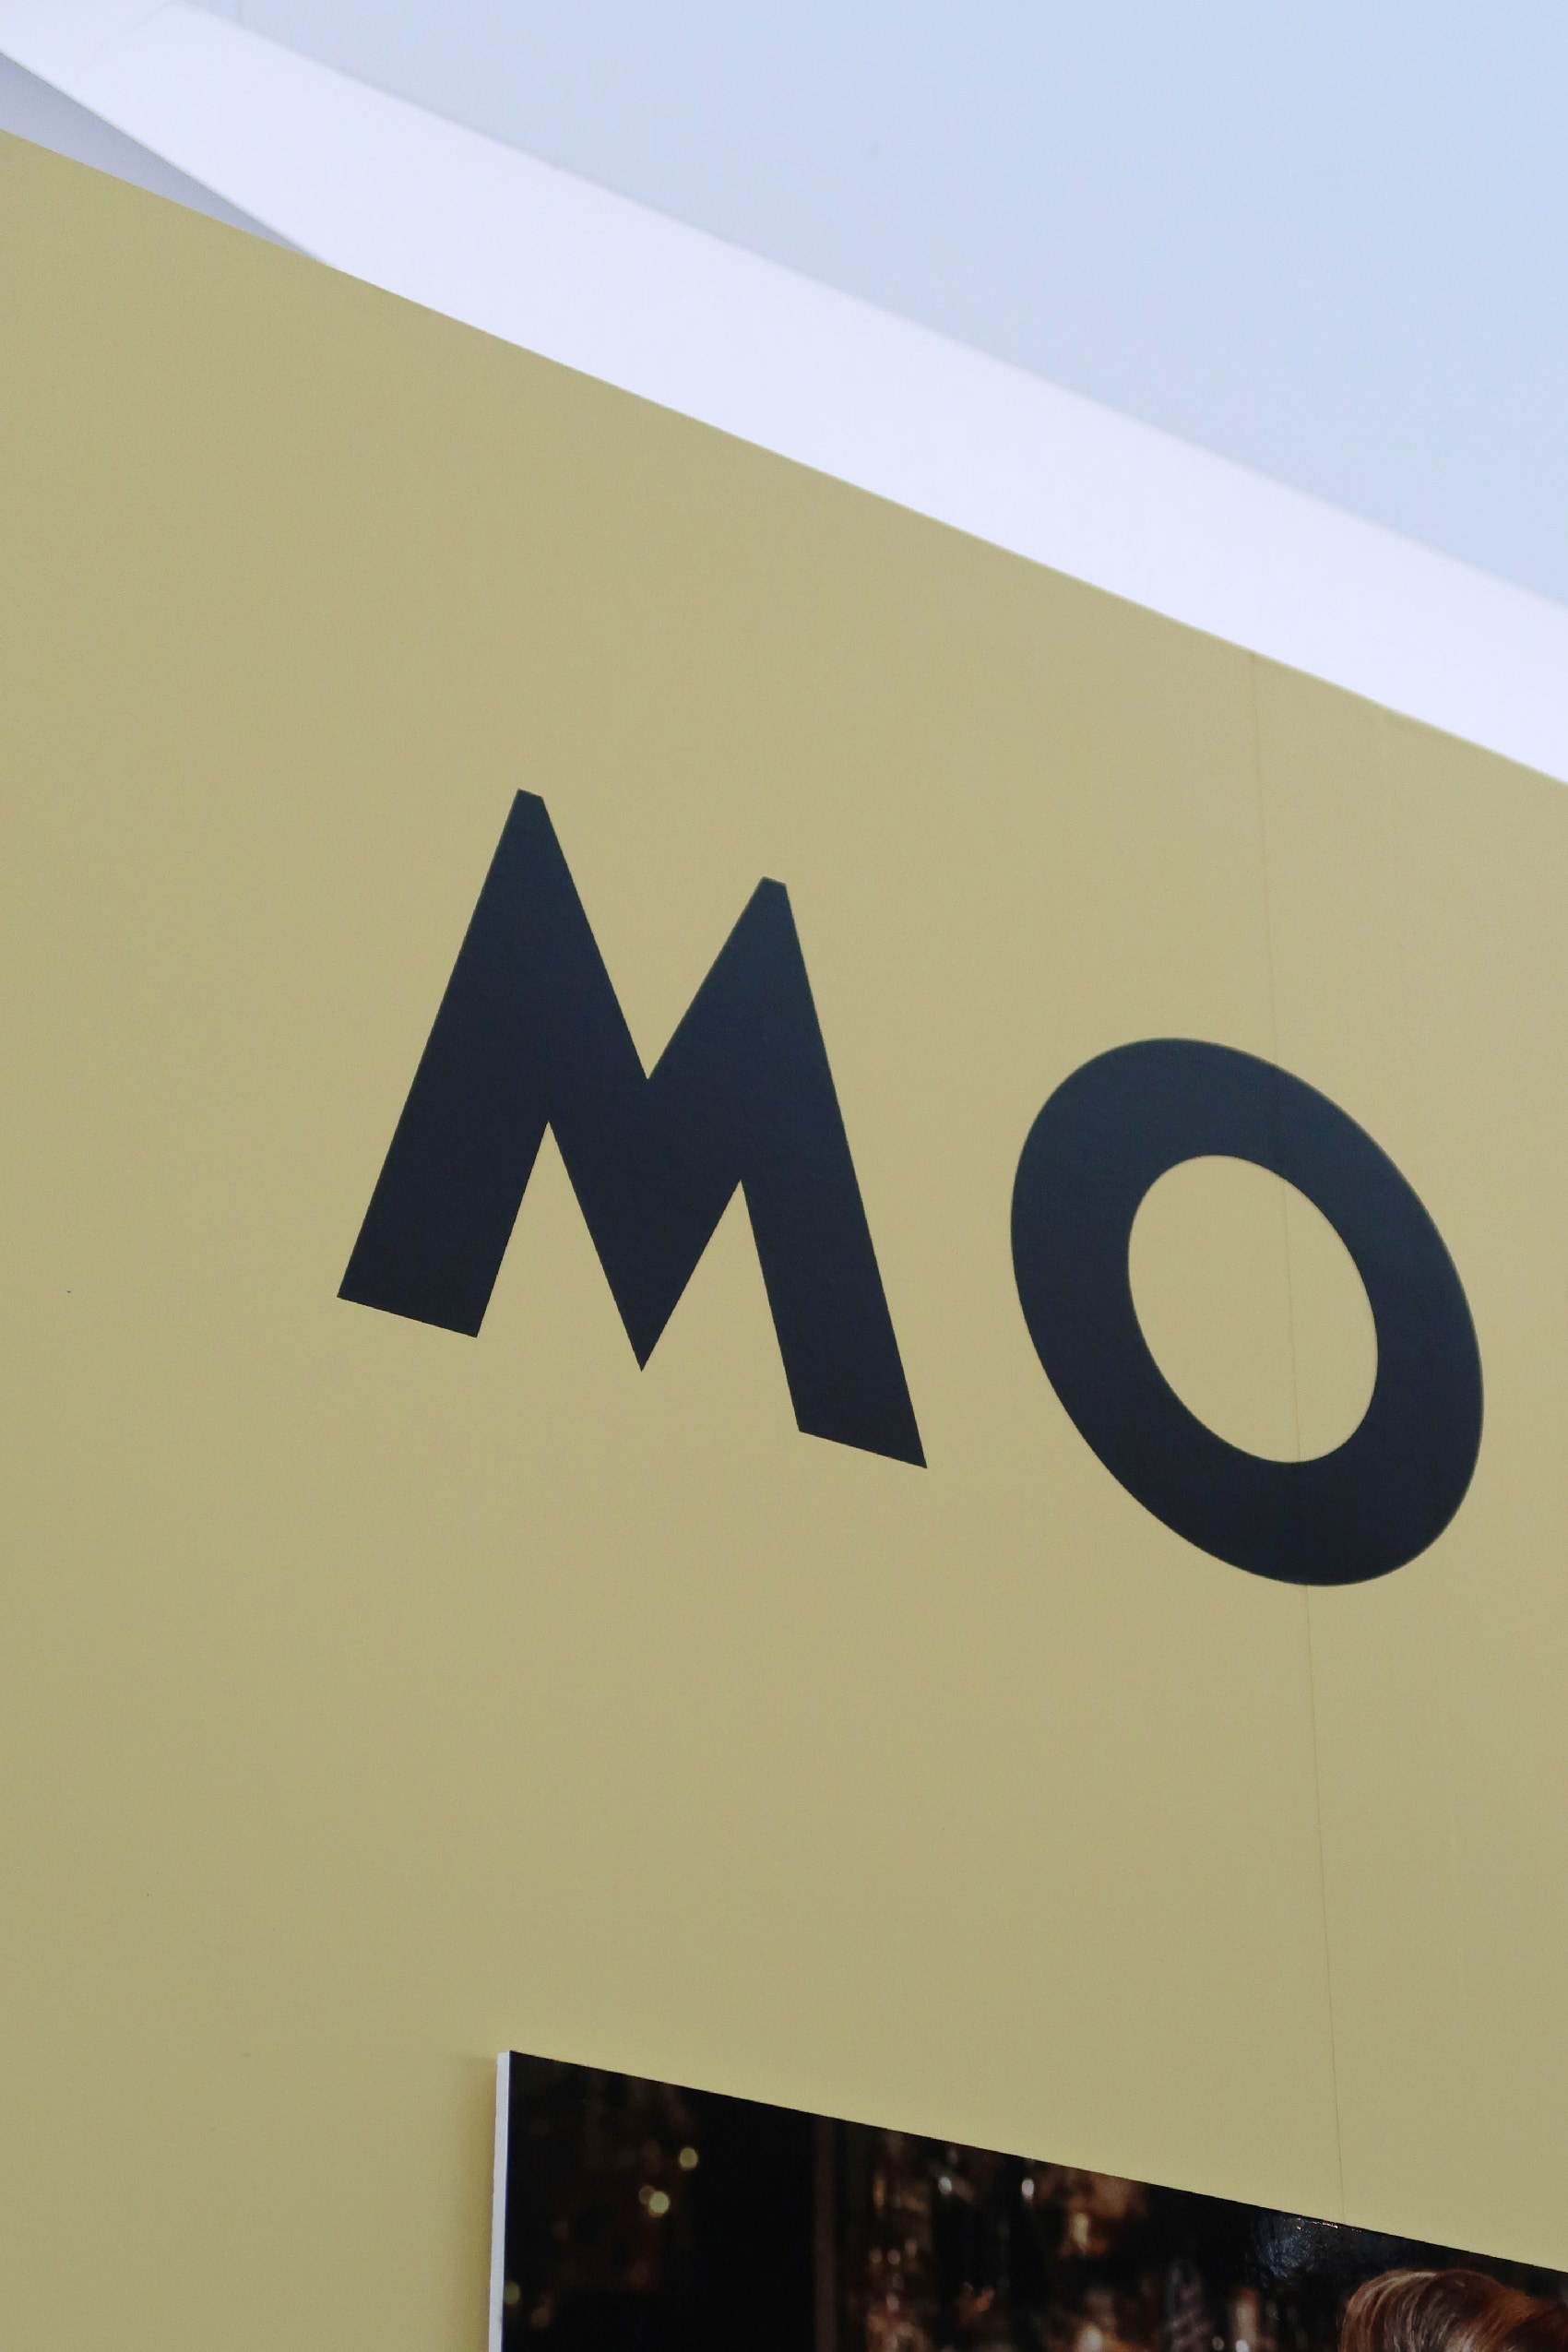 180427_moscot-01